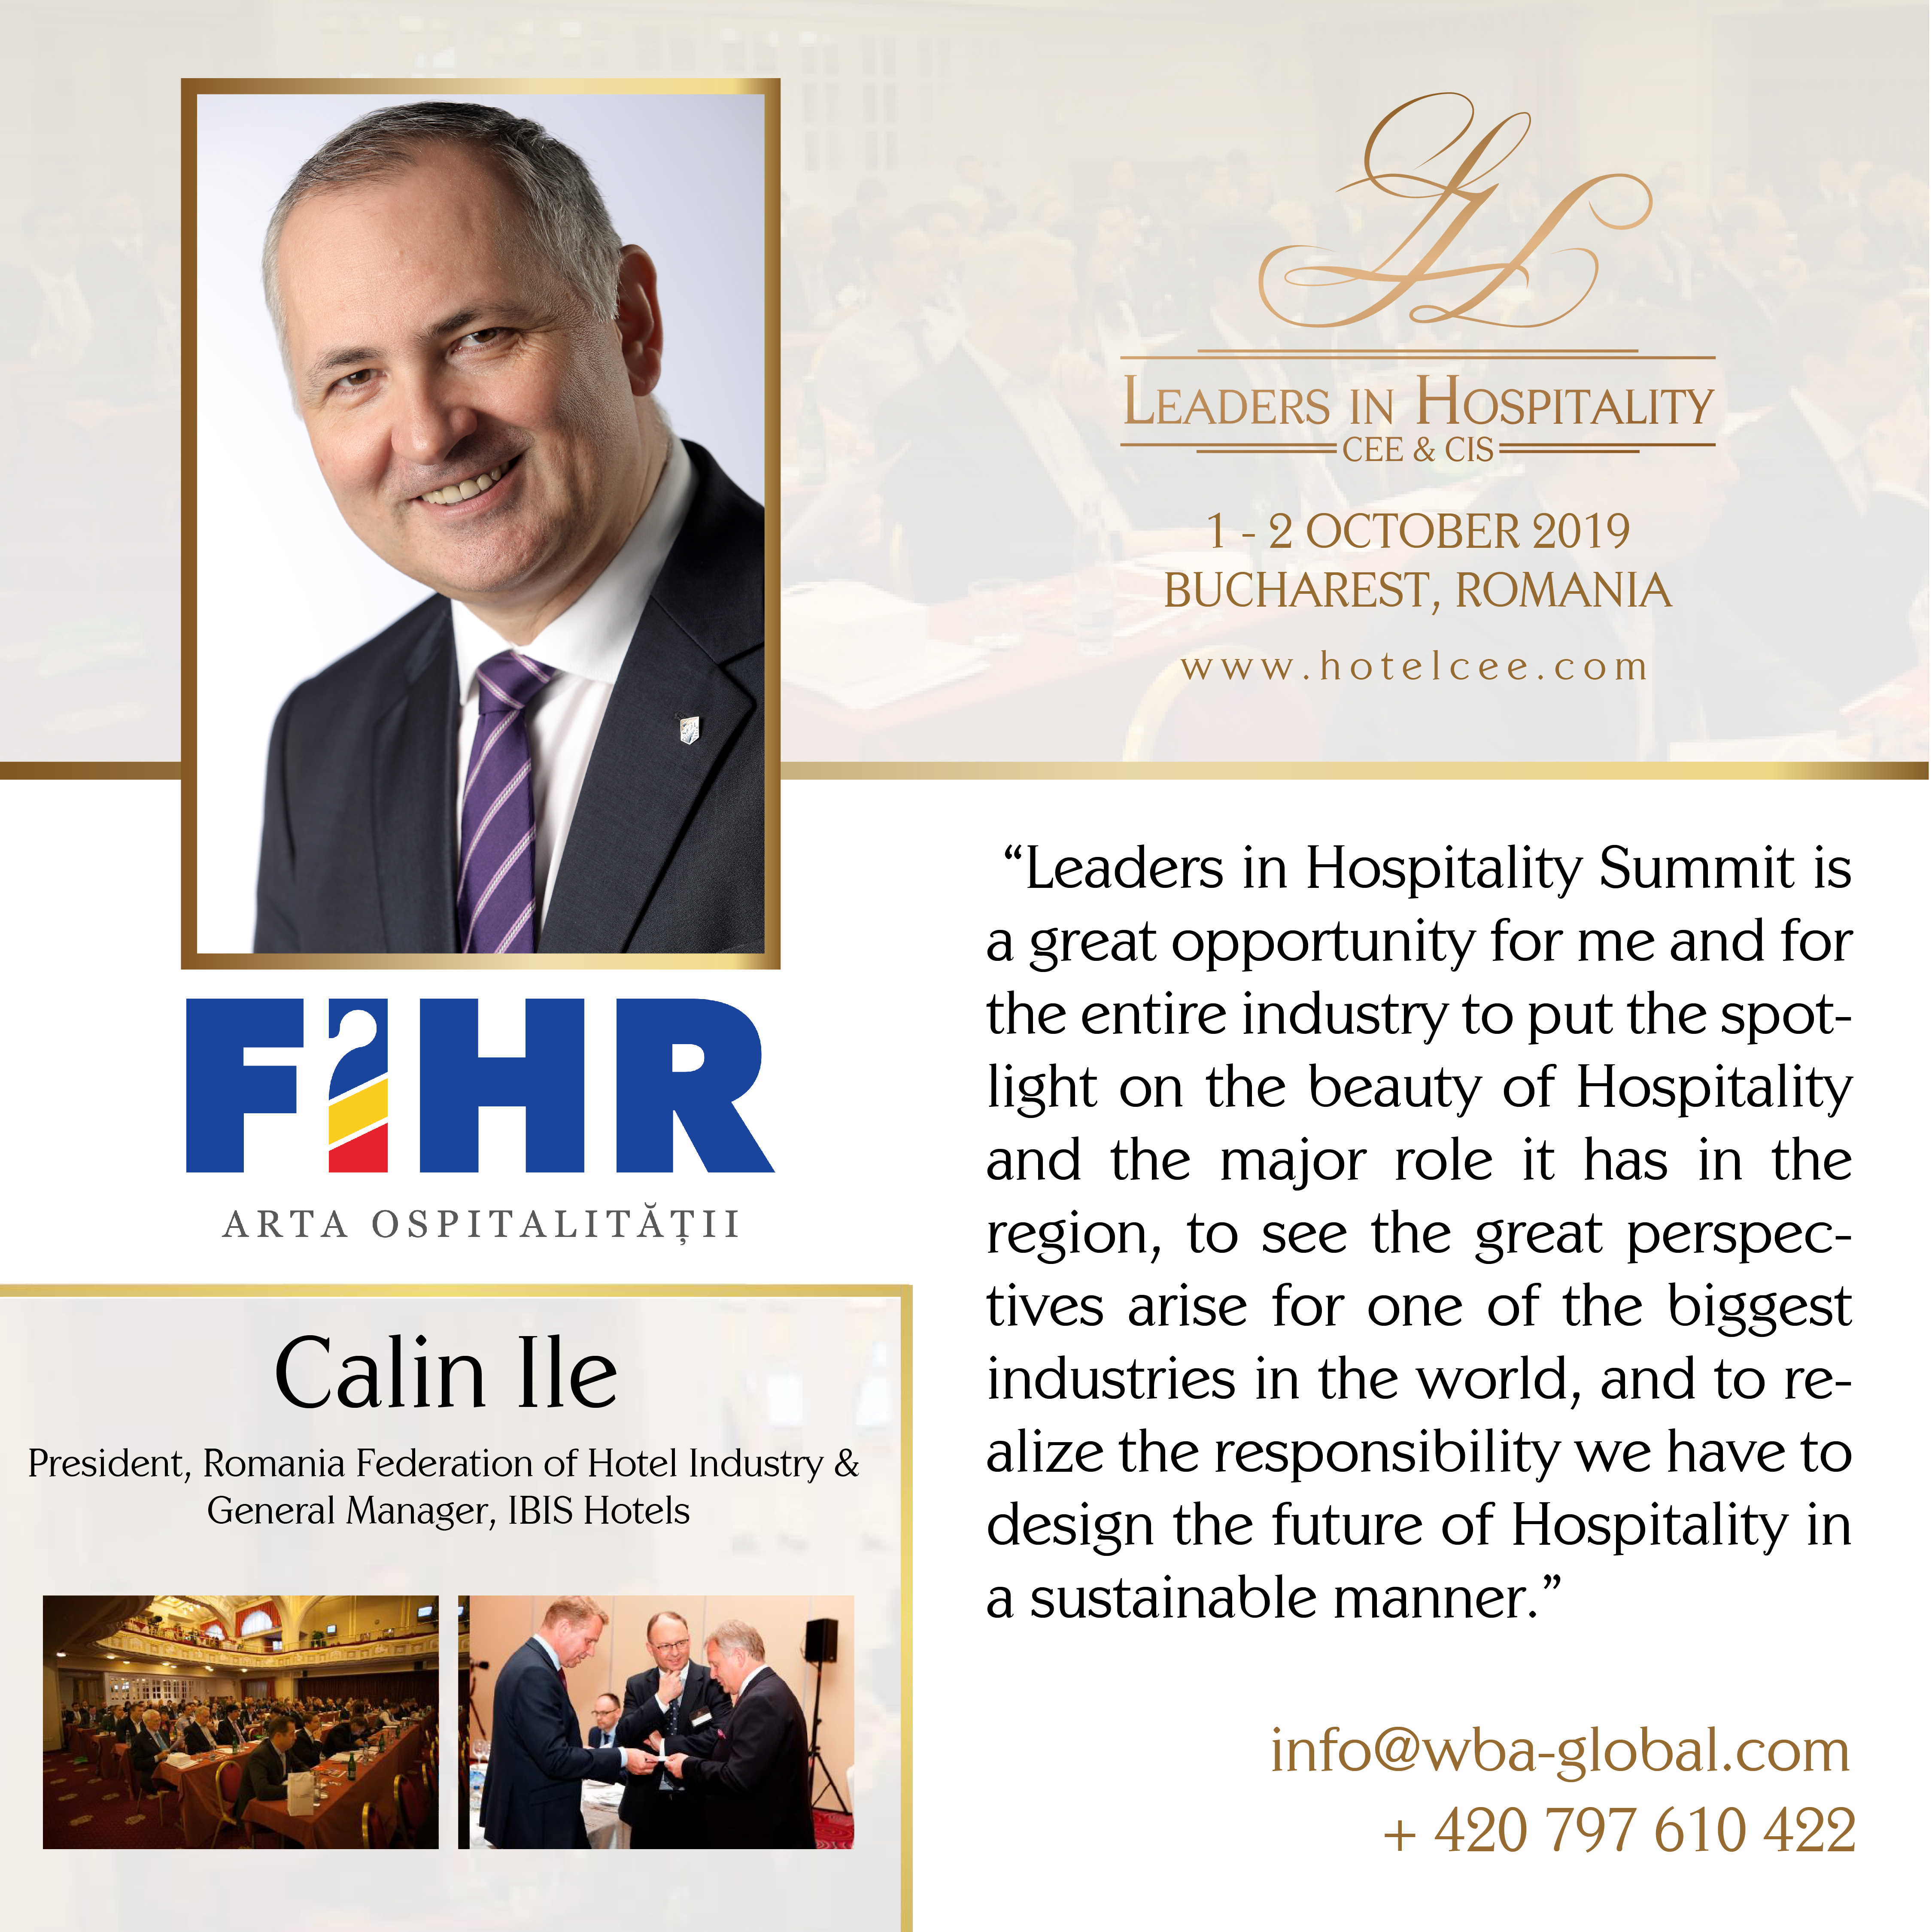 Calin Ile despre Leaders in Hospitality